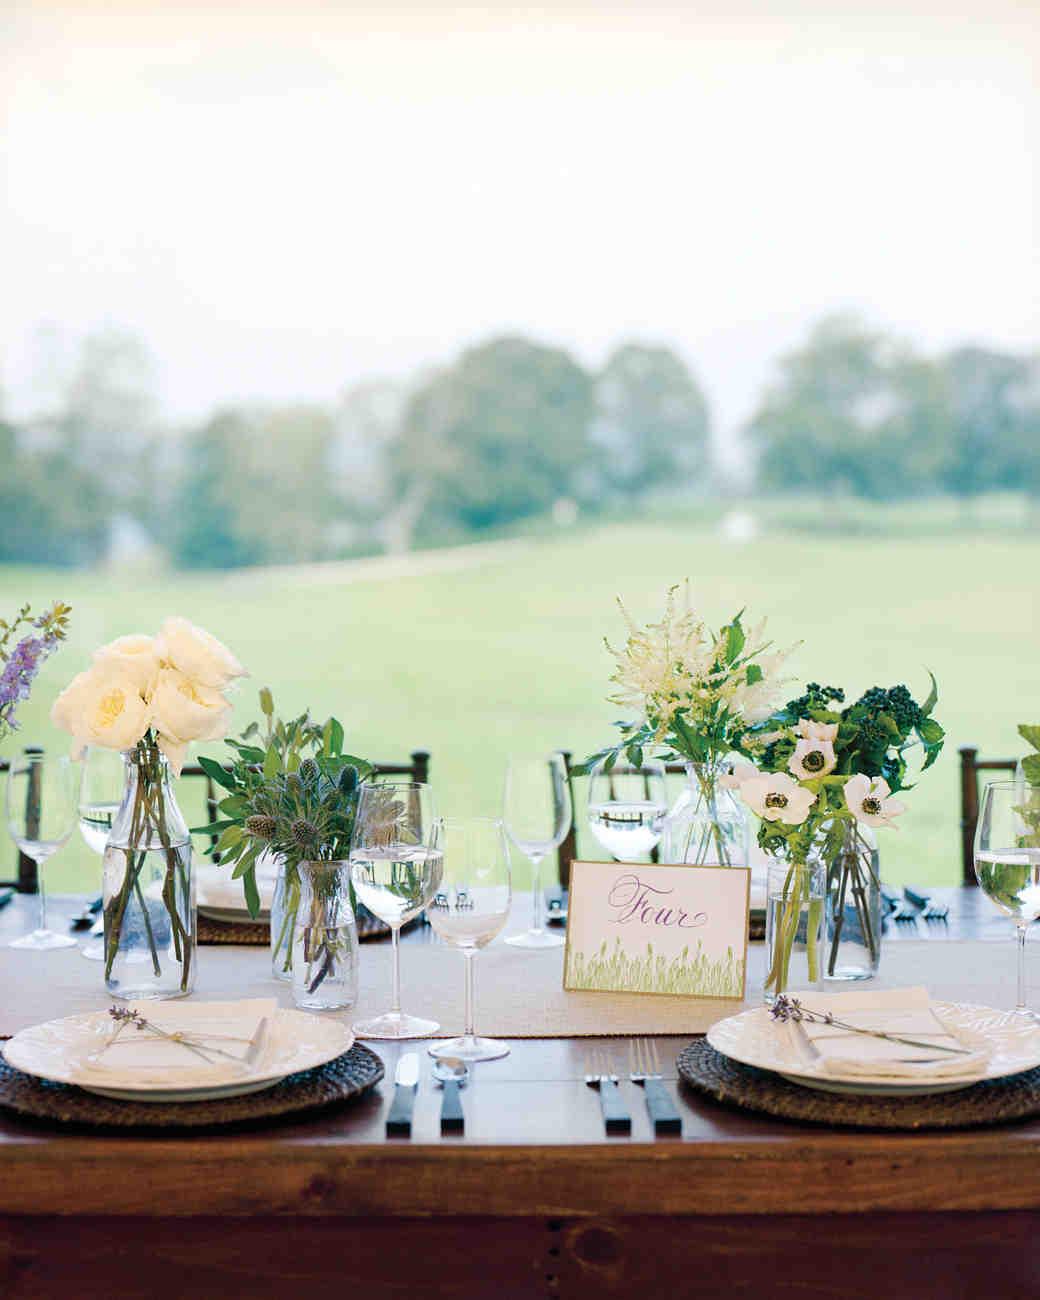 wedding reception arrangements for tables